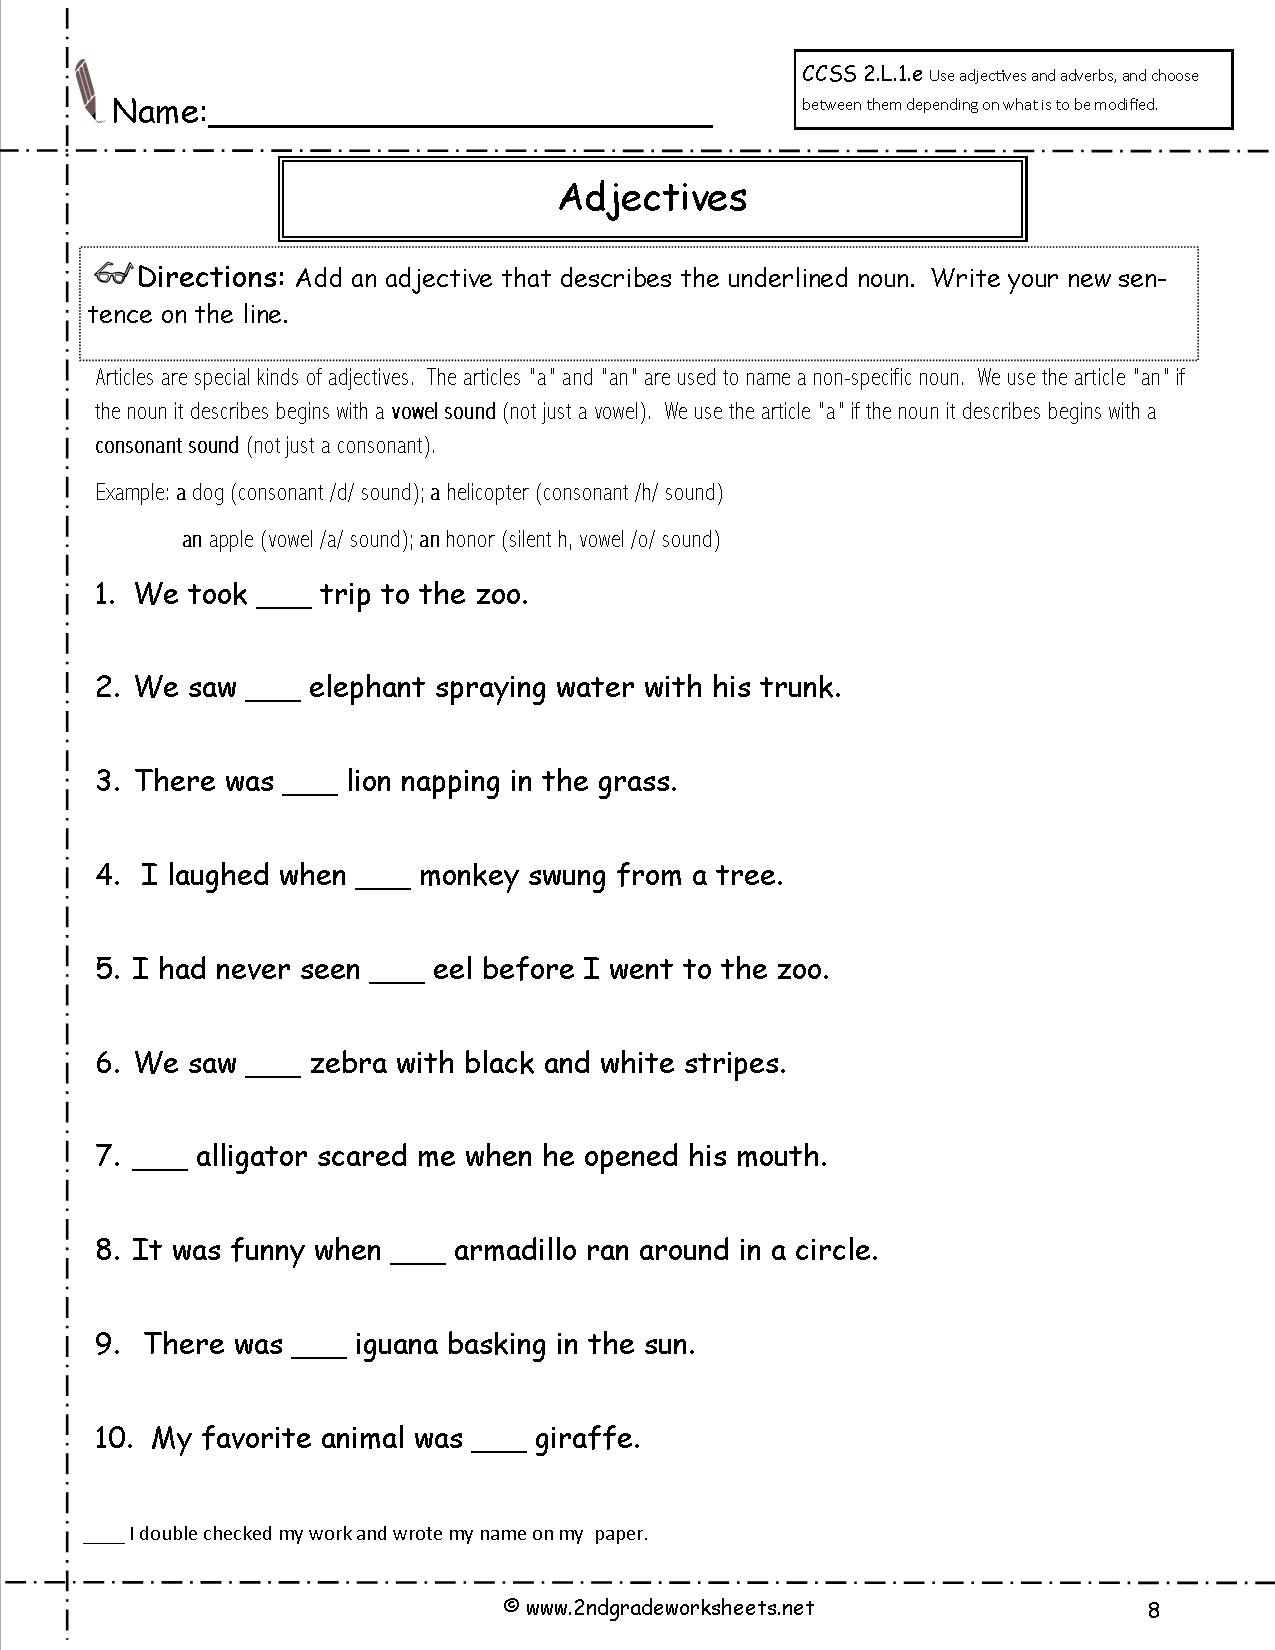 Free Language/grammar Worksheets And Printouts - Free Printable Grammar Worksheets For Highschool Students